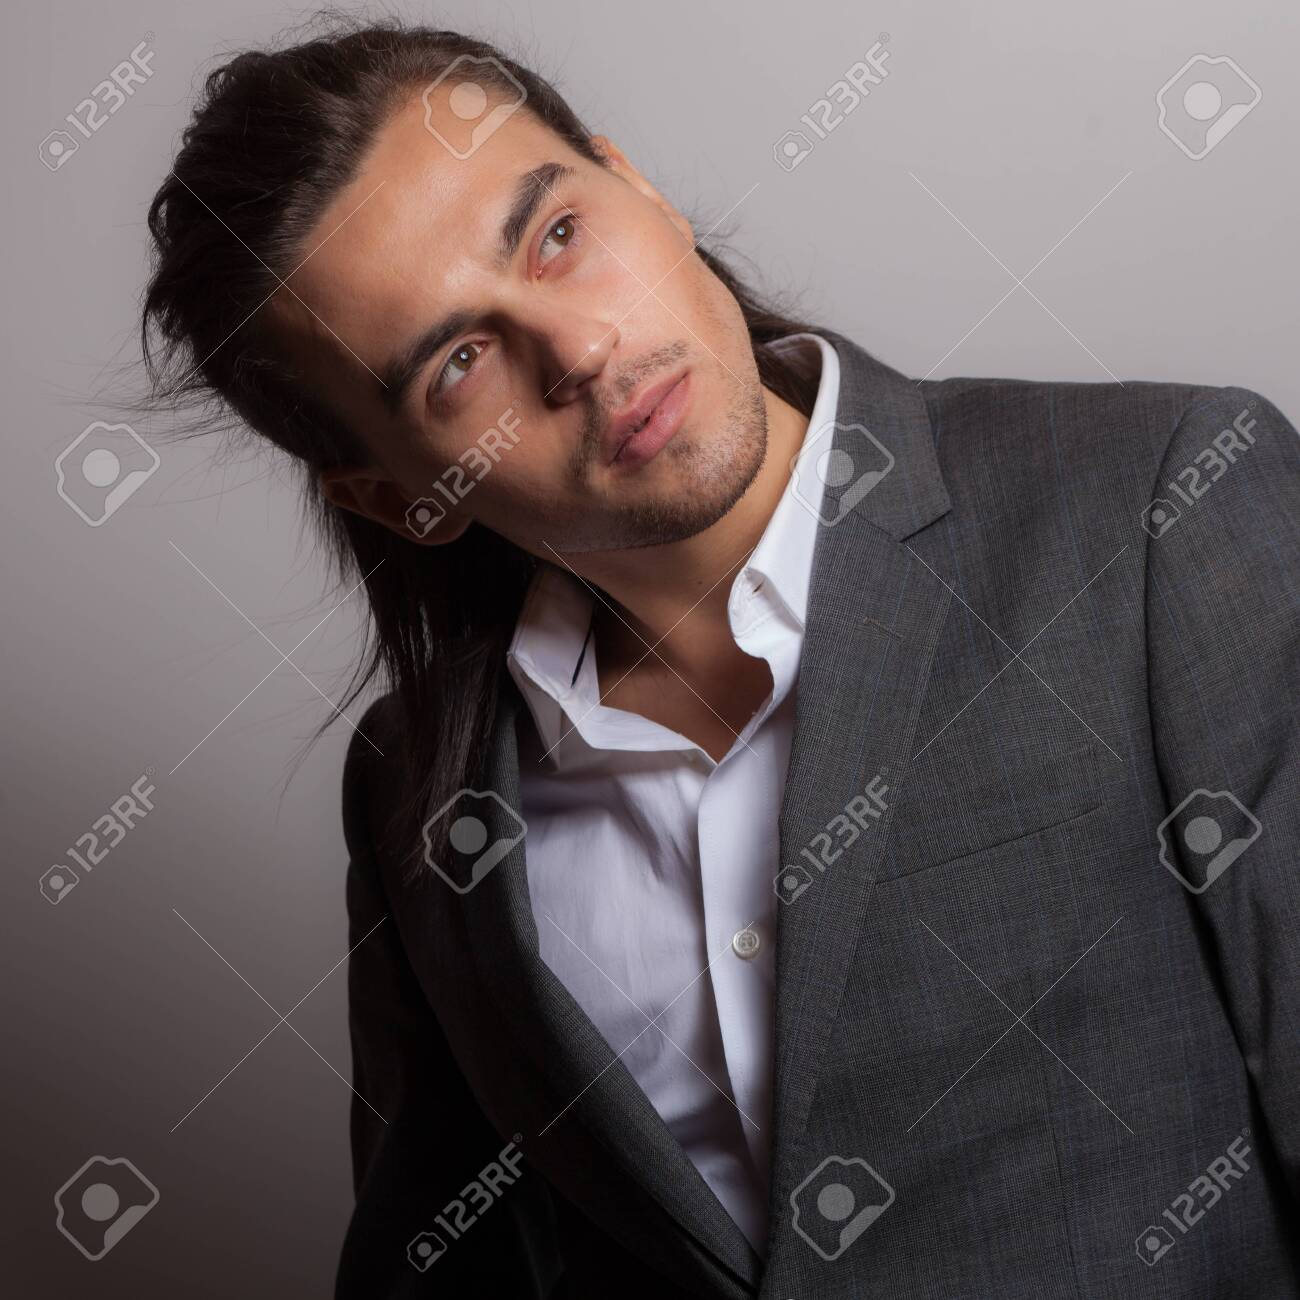 Handsome young elegant man studio portrait. - 139643041